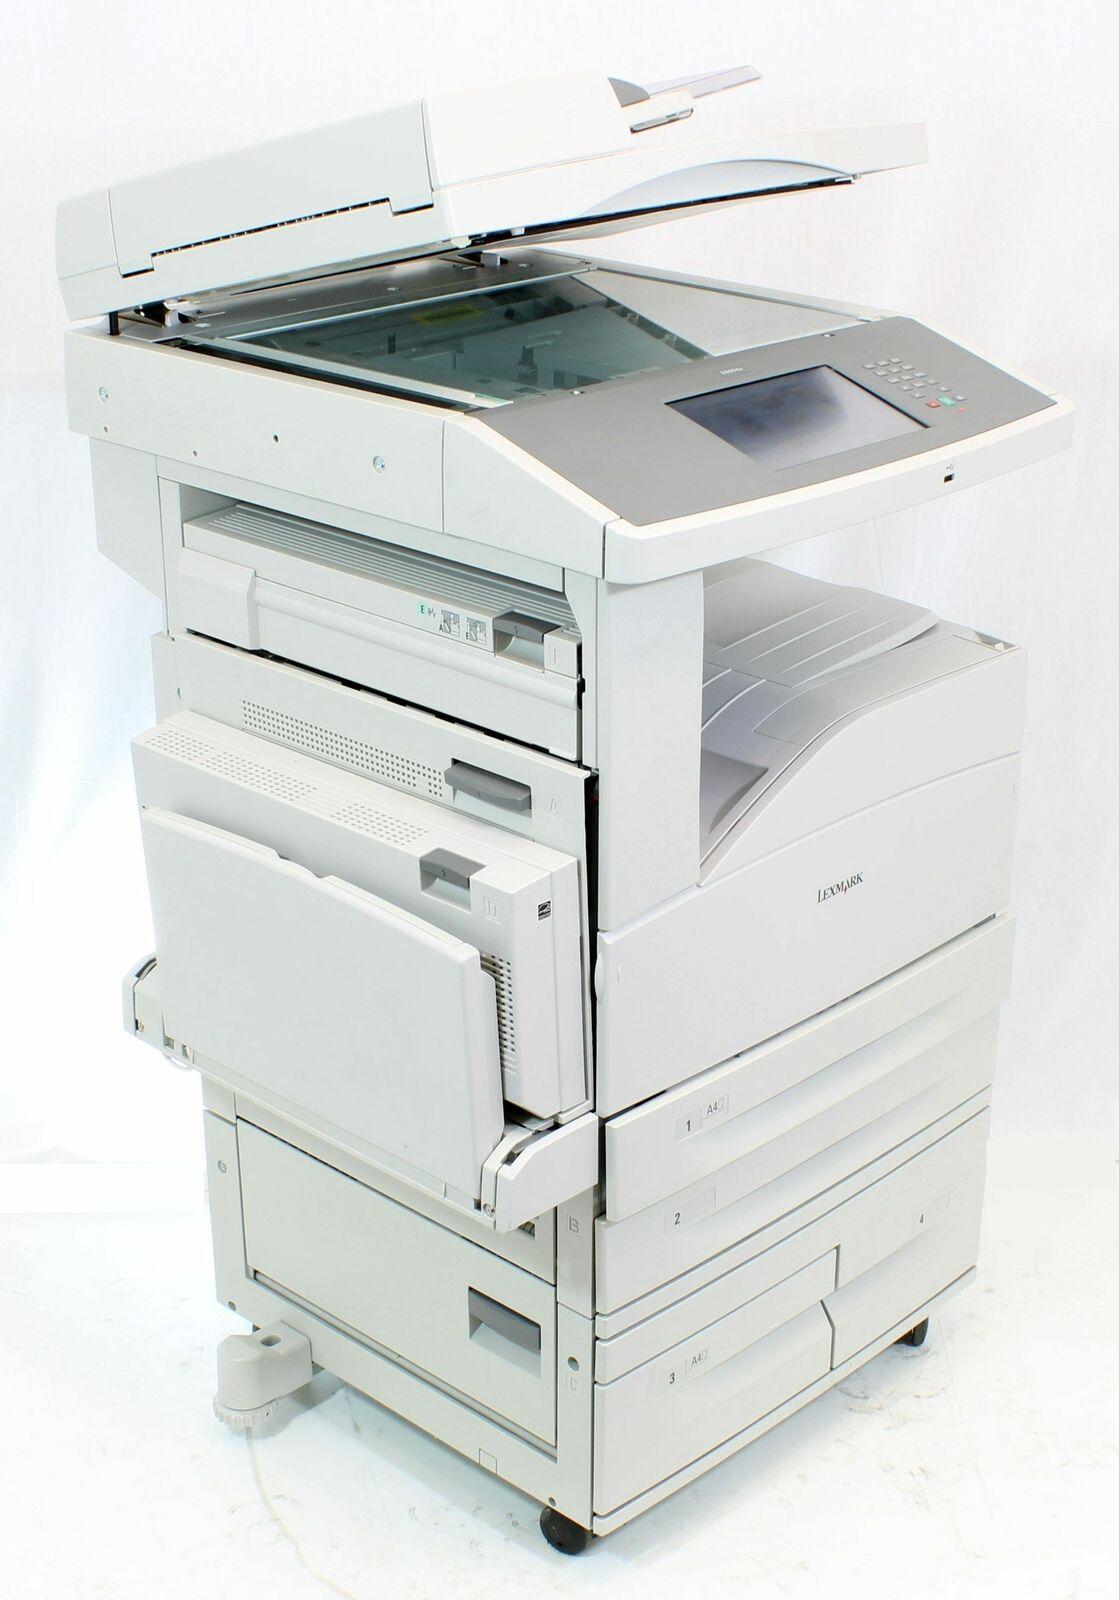 Lexmark Drucker X860de Laserdrucker DIN A3 Kopierer Scanner Fax gebraucht